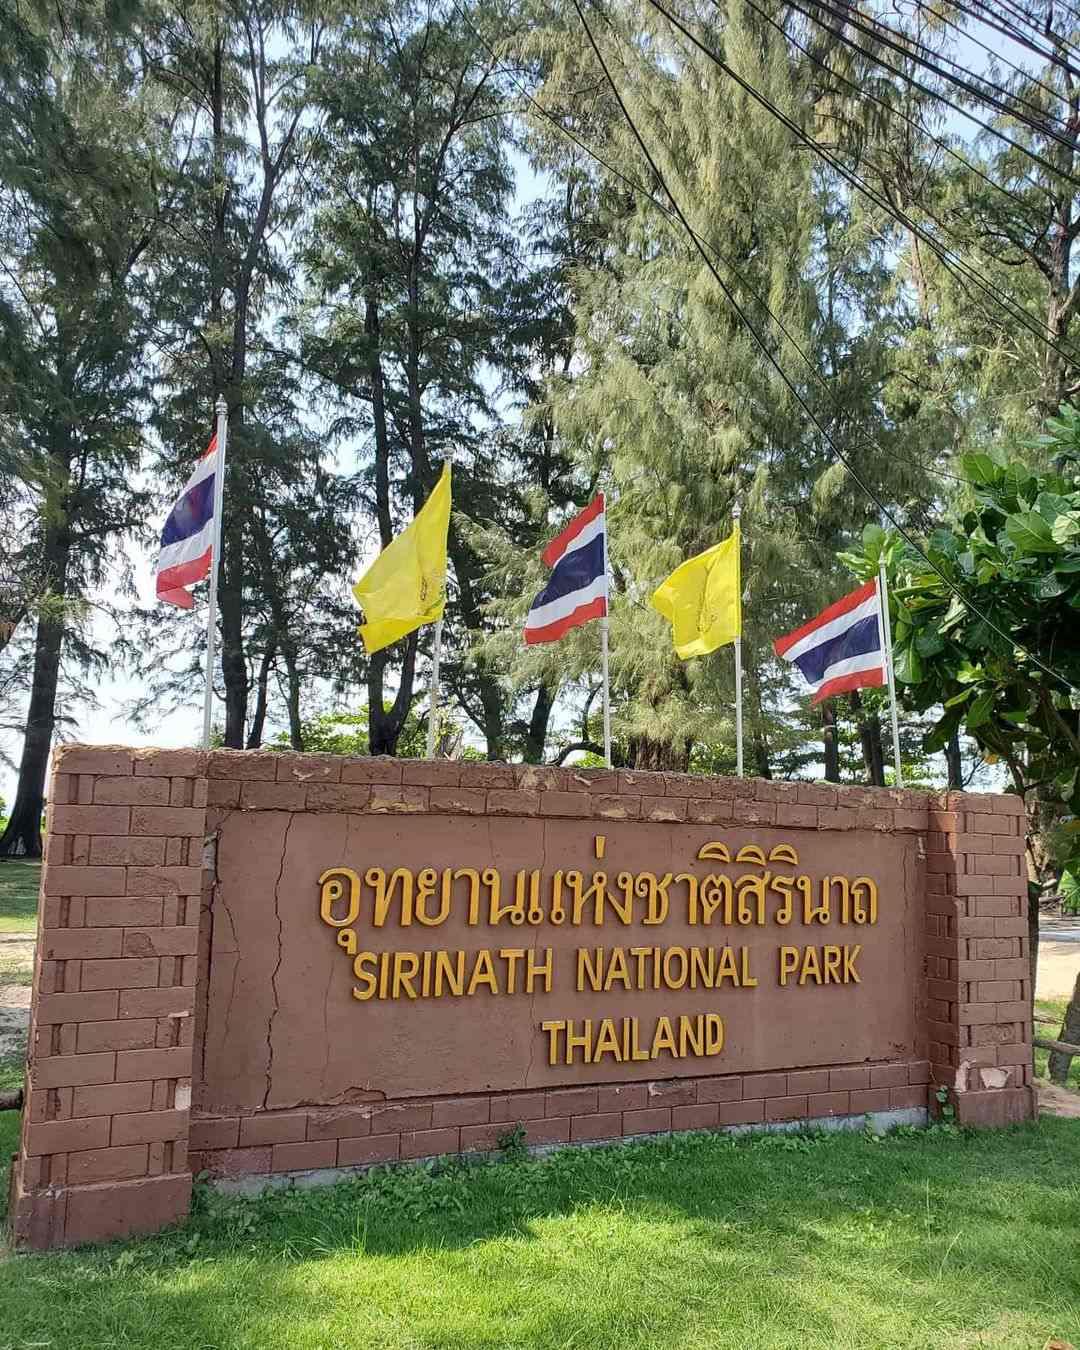 Bord van het Sirinat National Park